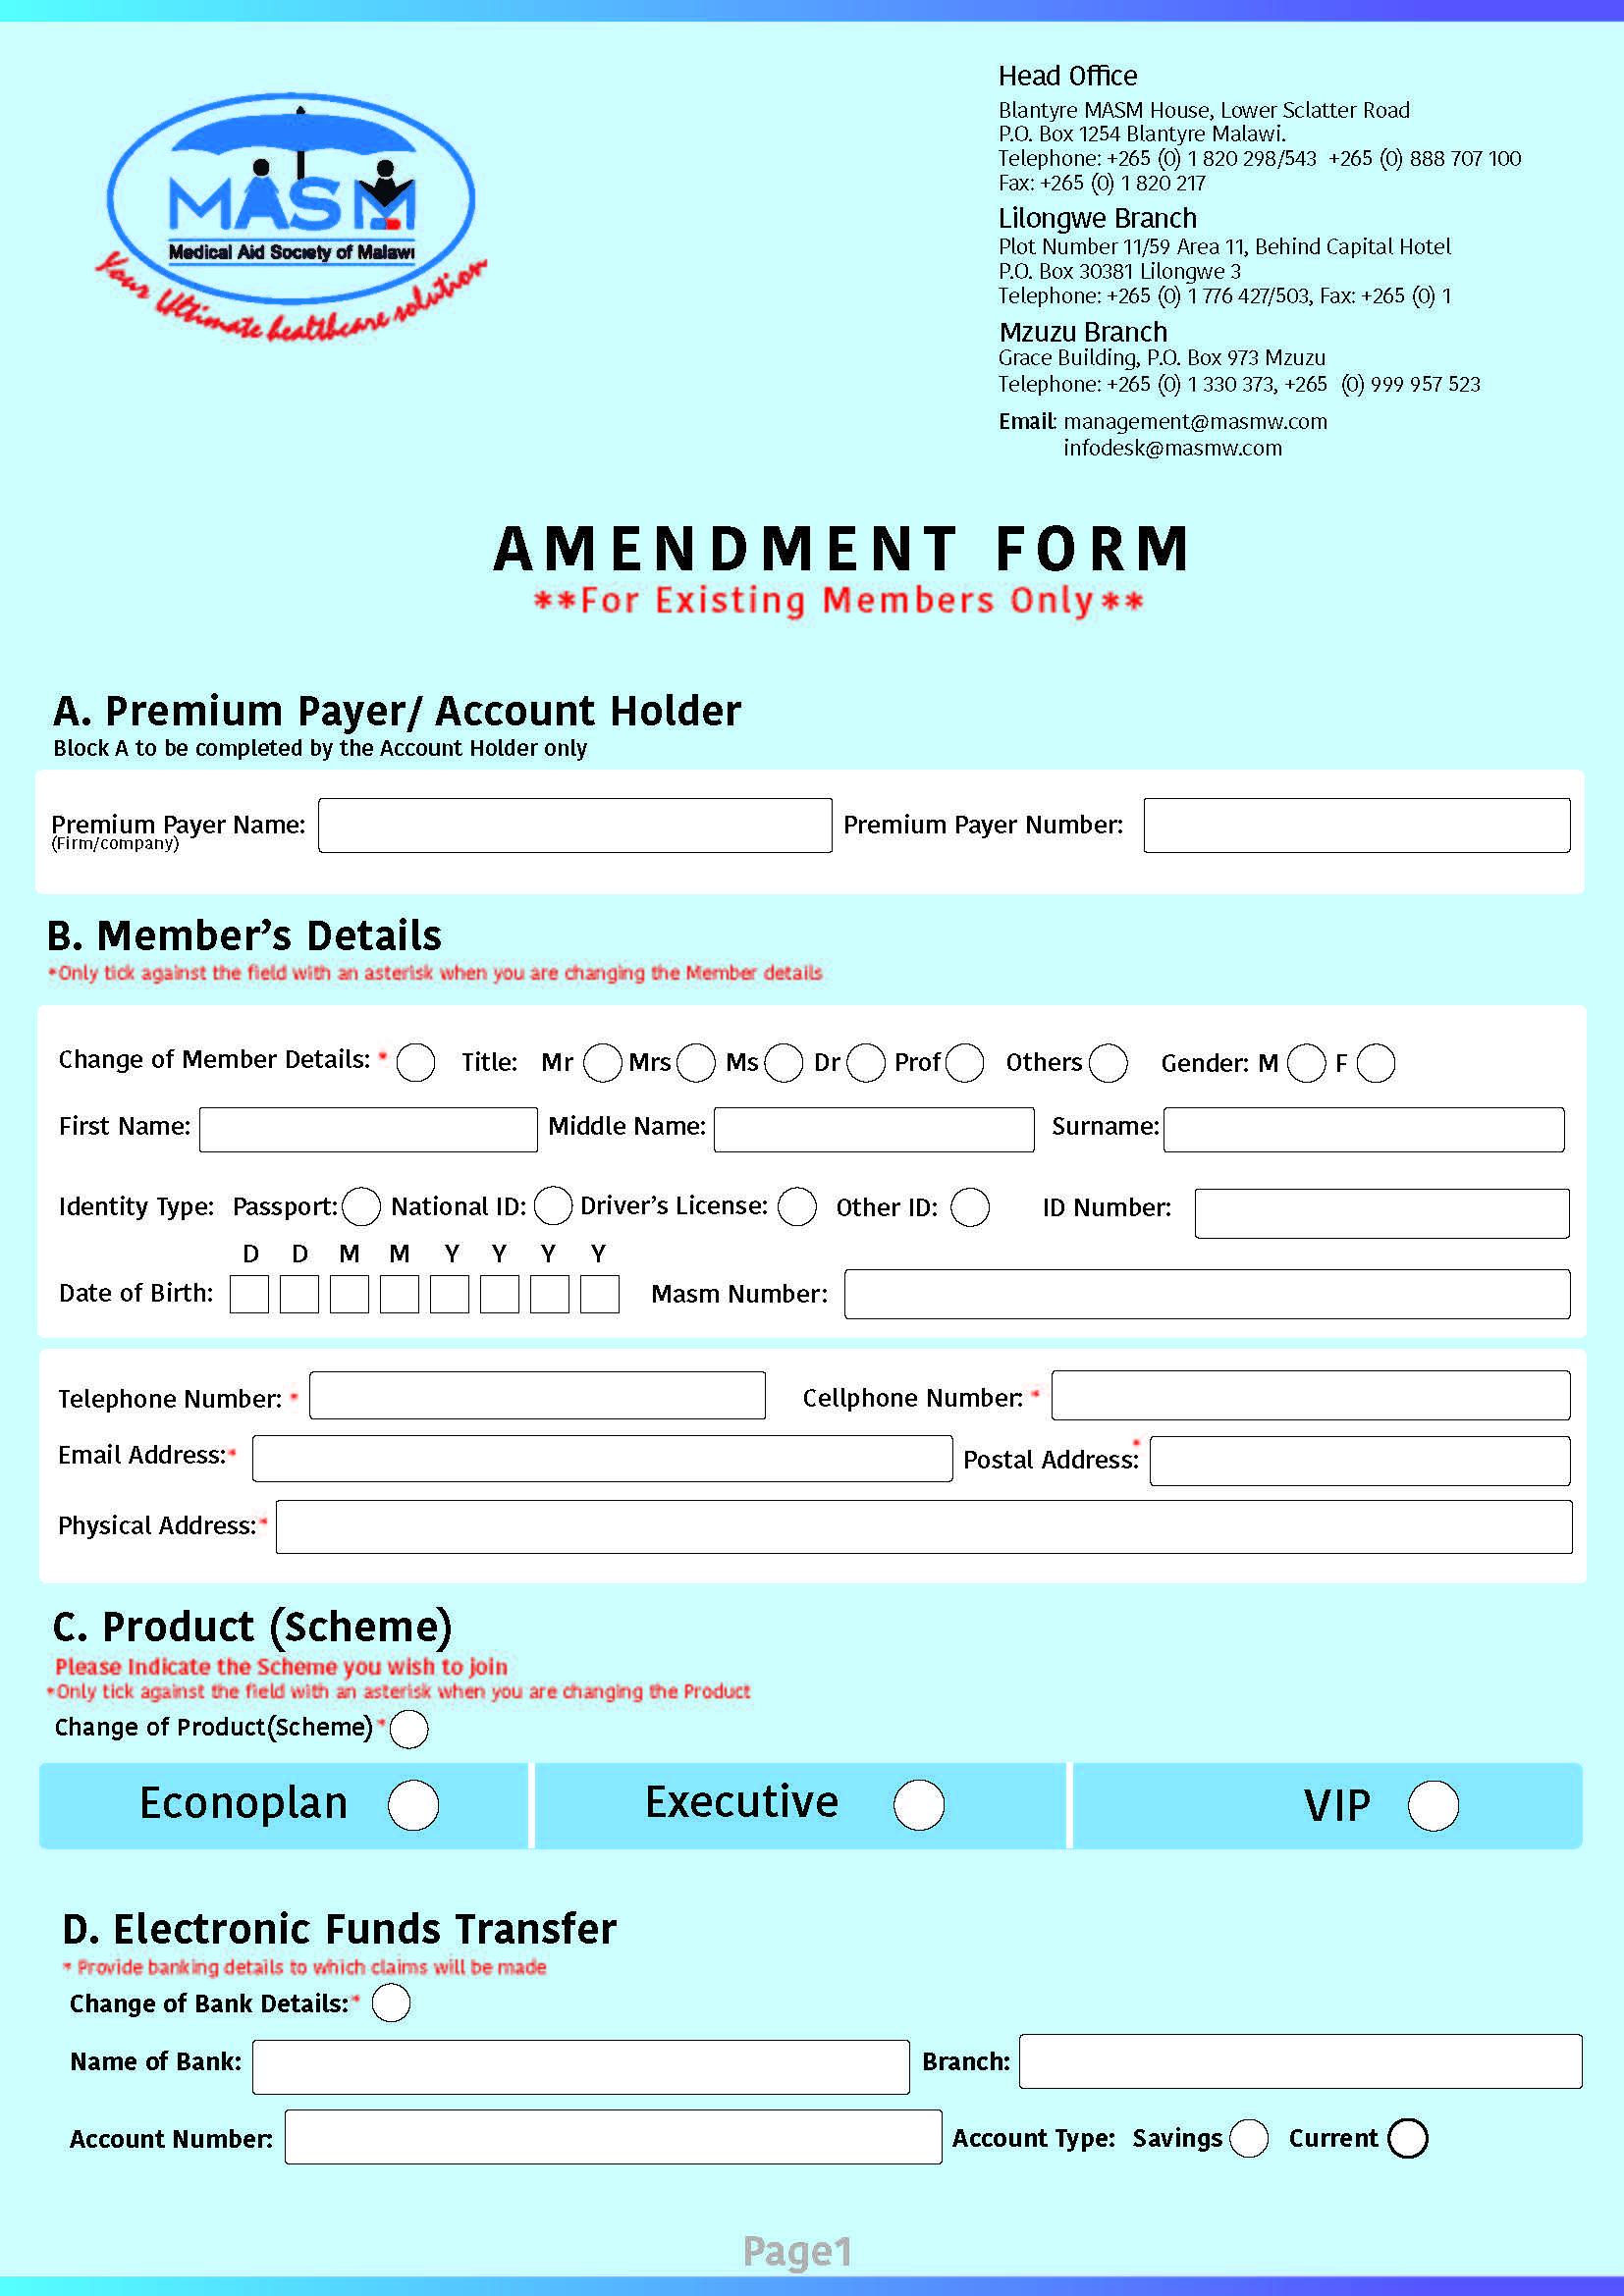 Amendment Form for Existing Customers